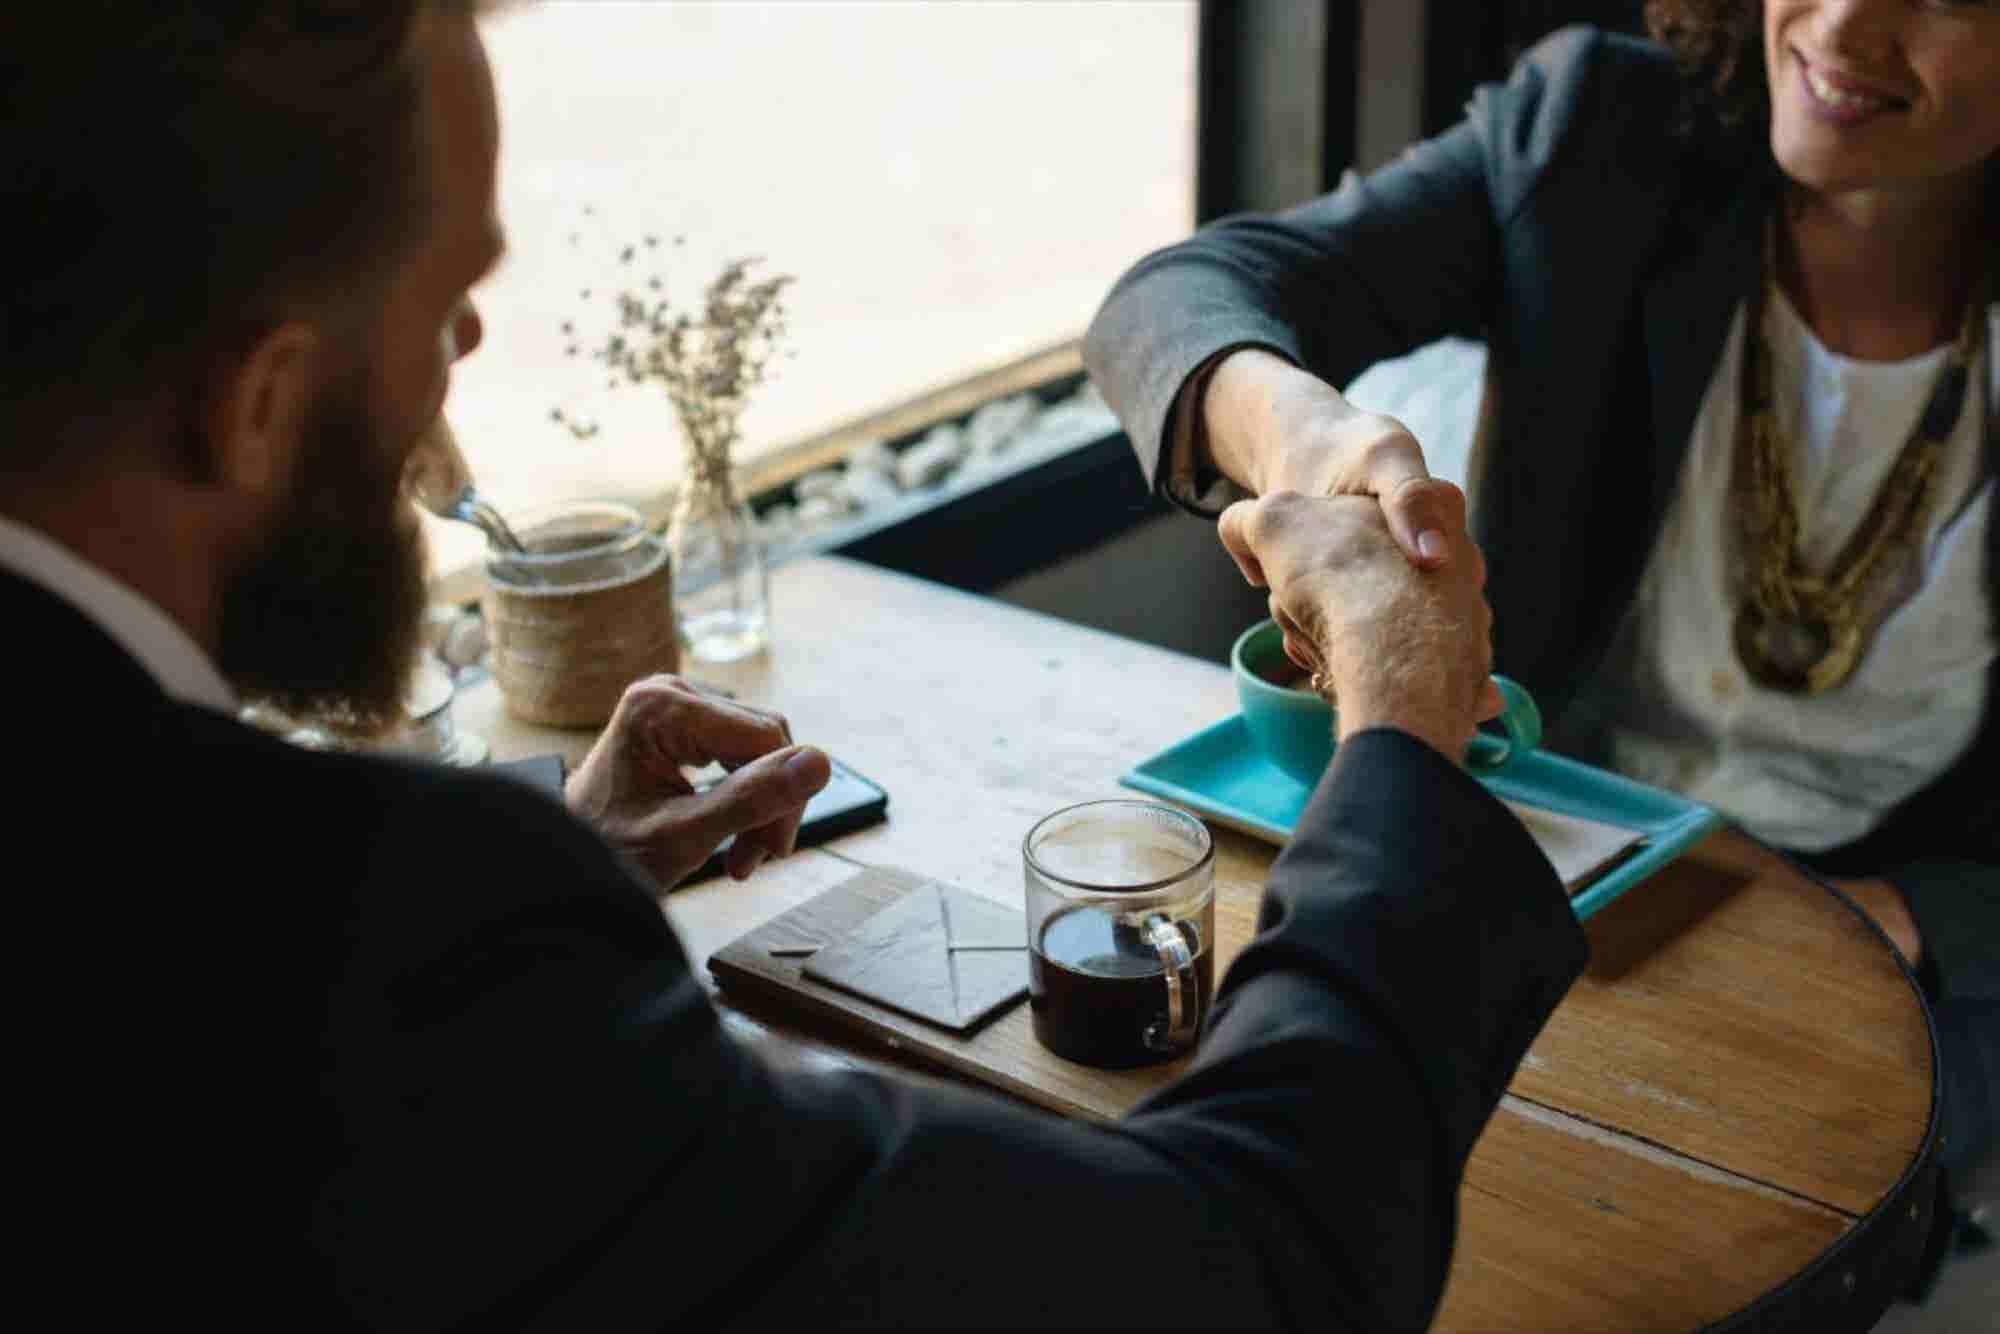 6 claves para negociar con éxito para lograr tus objetivos